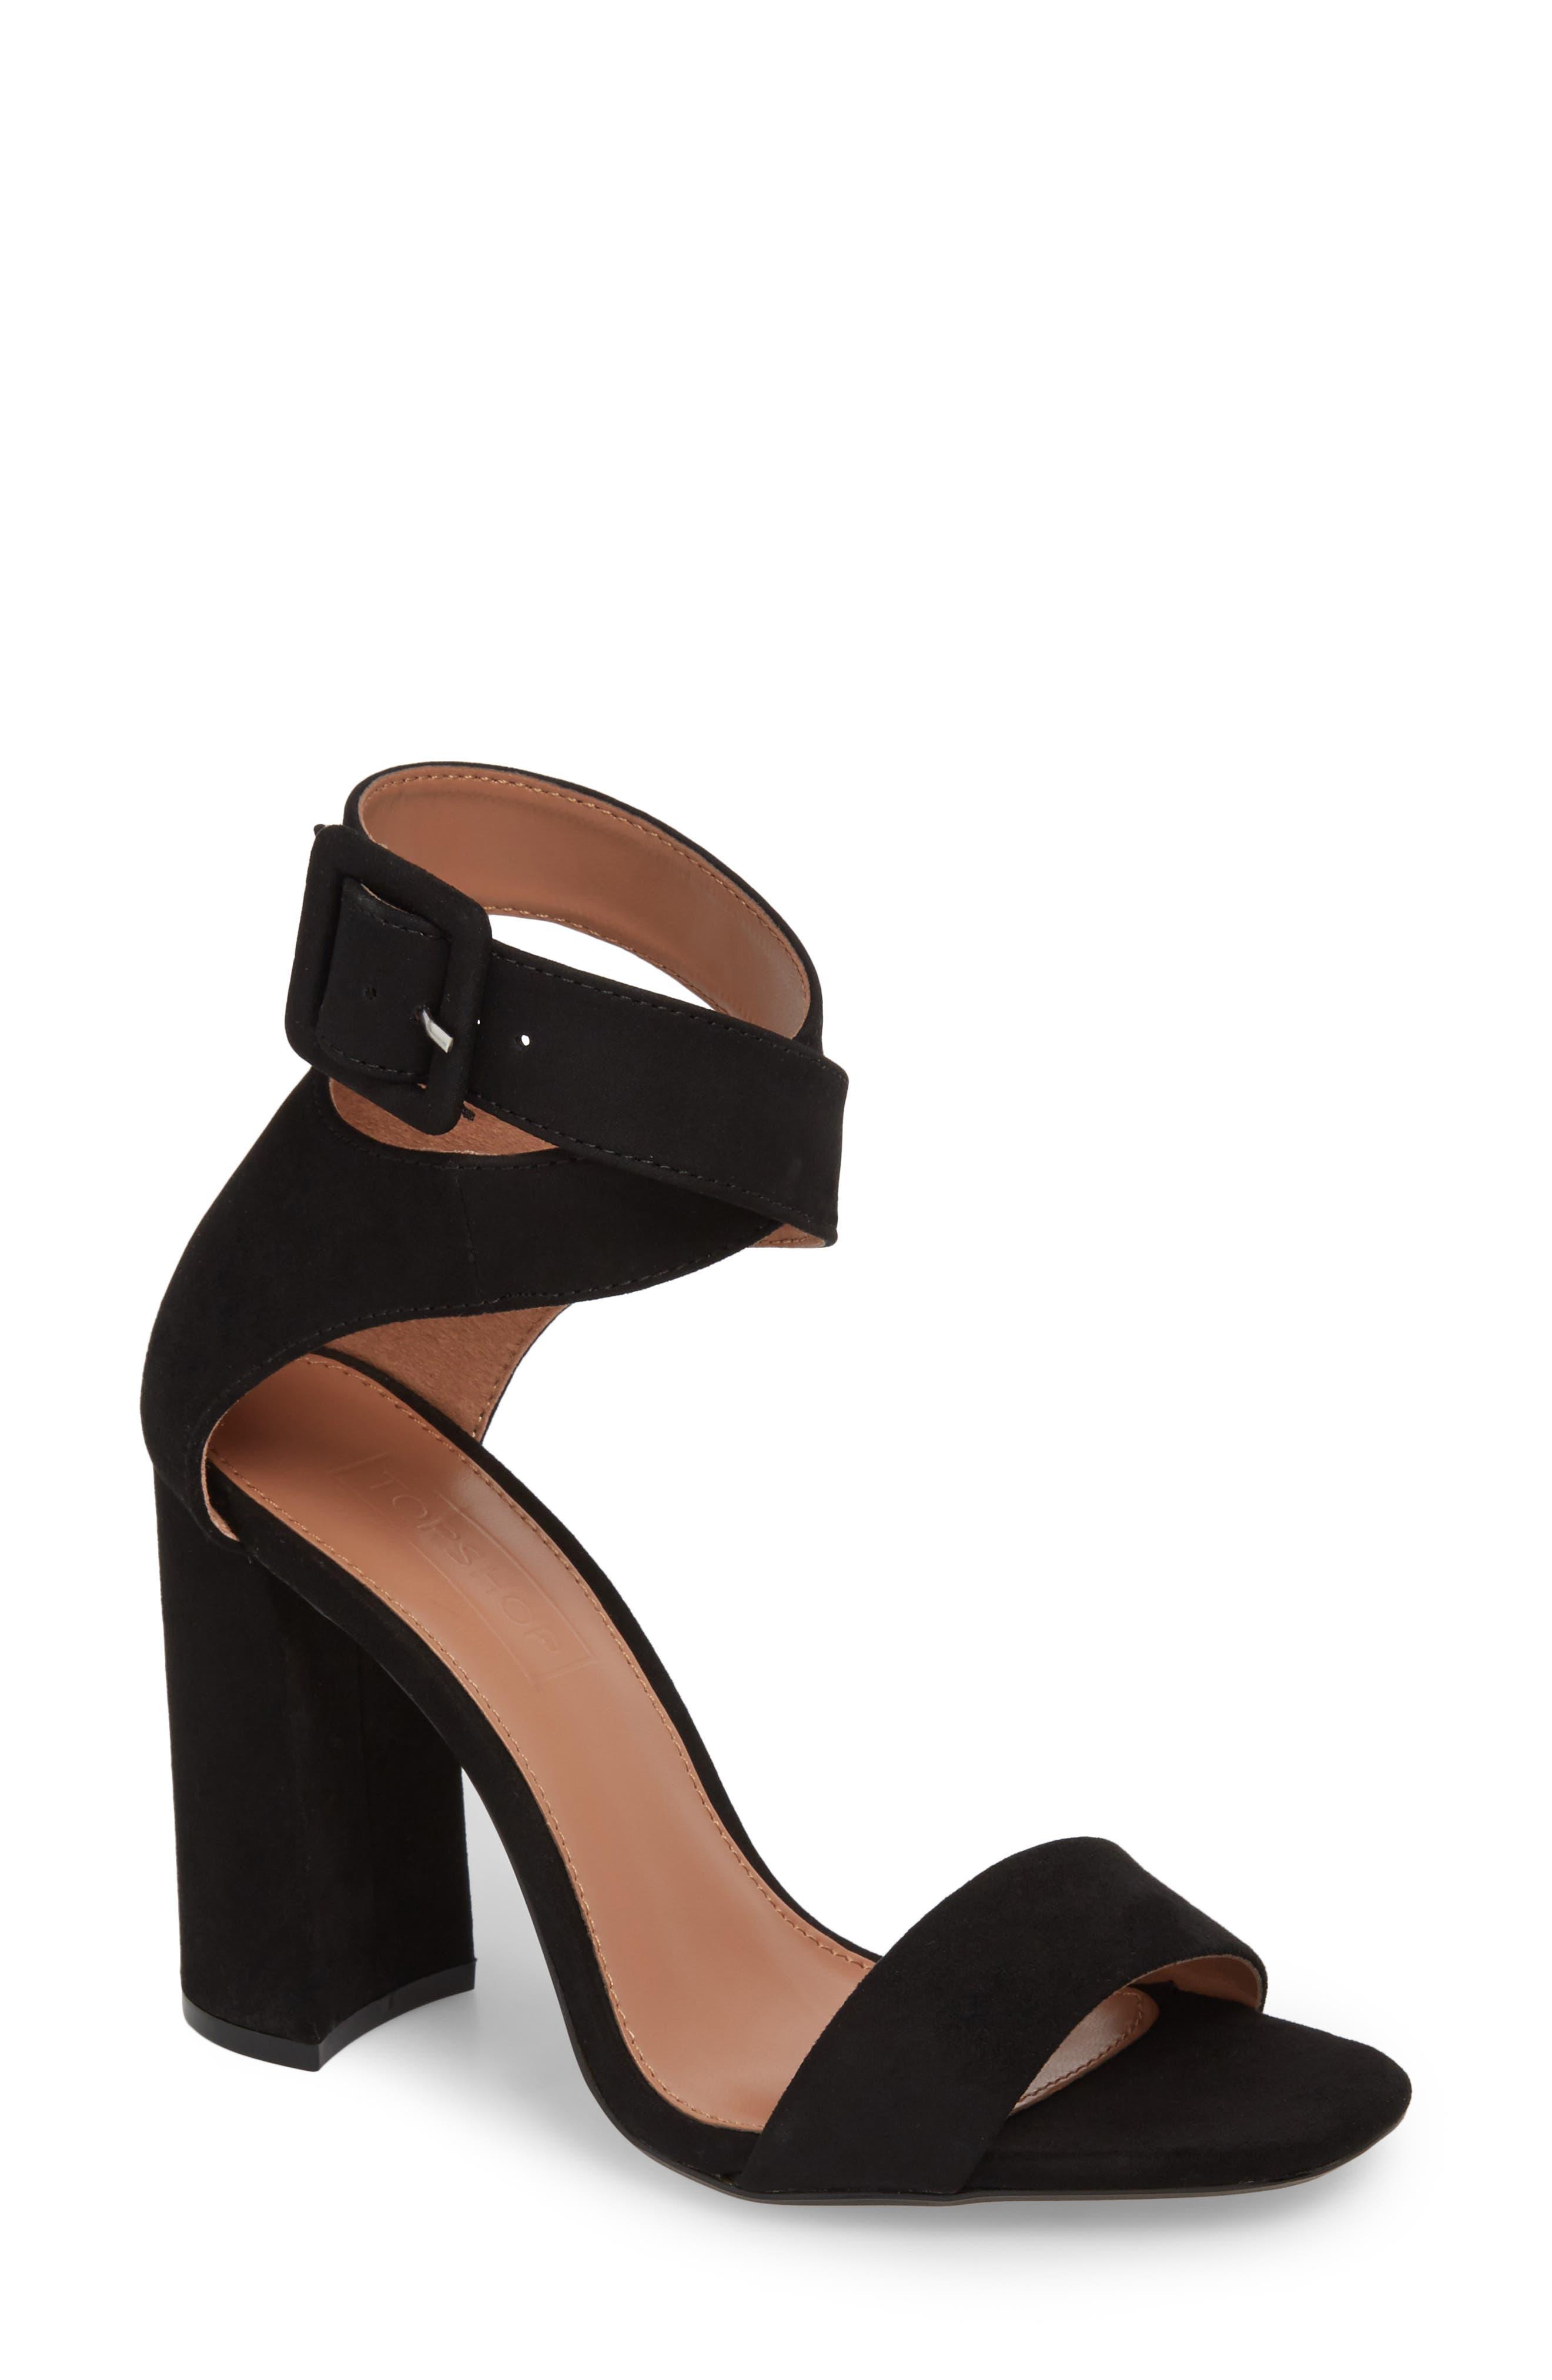 Sinitta Crossover Sandal,                             Main thumbnail 1, color,                             Black